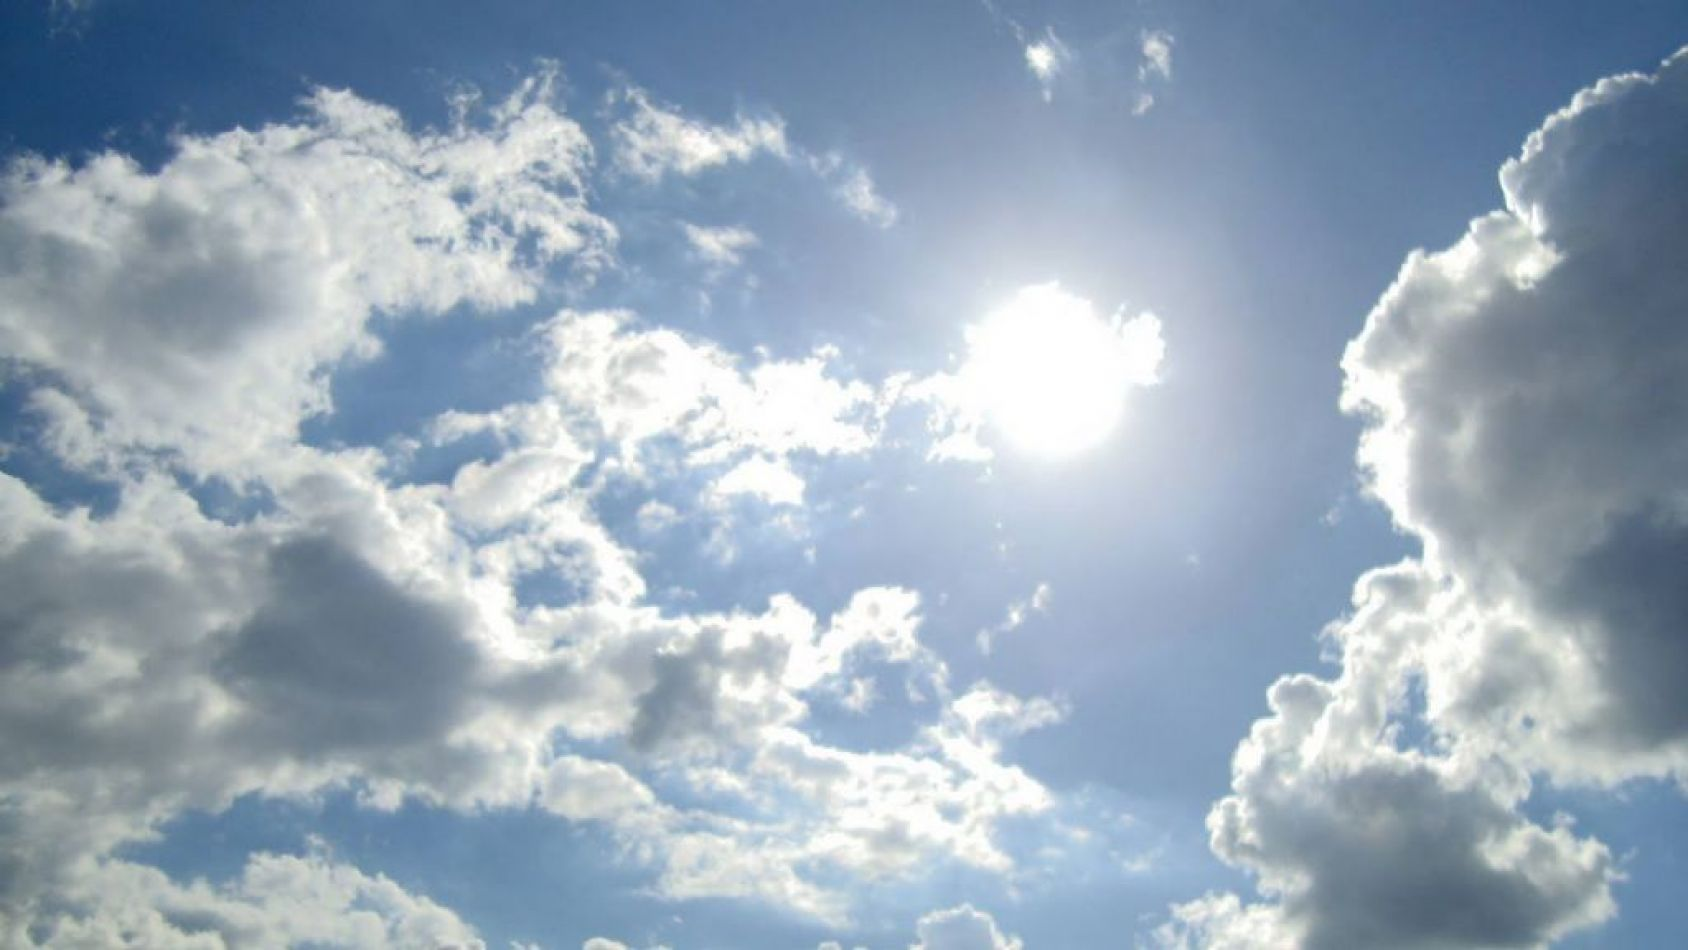 Anuncian días de pleno sol para esta Semana Santa en Salta